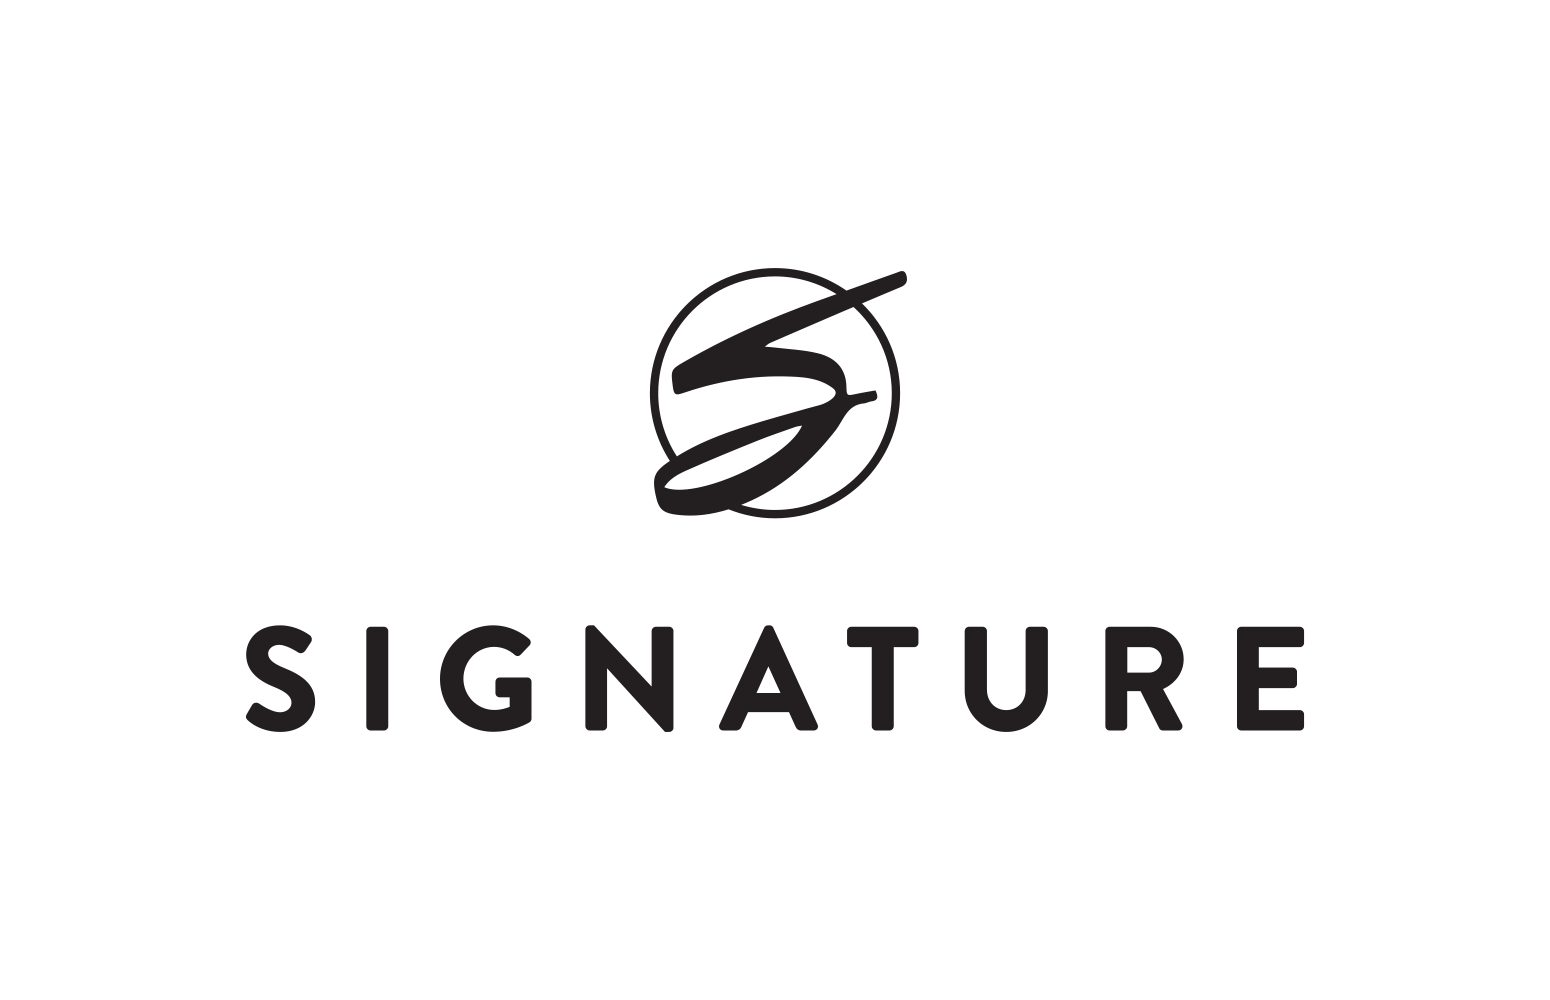 Signature Party